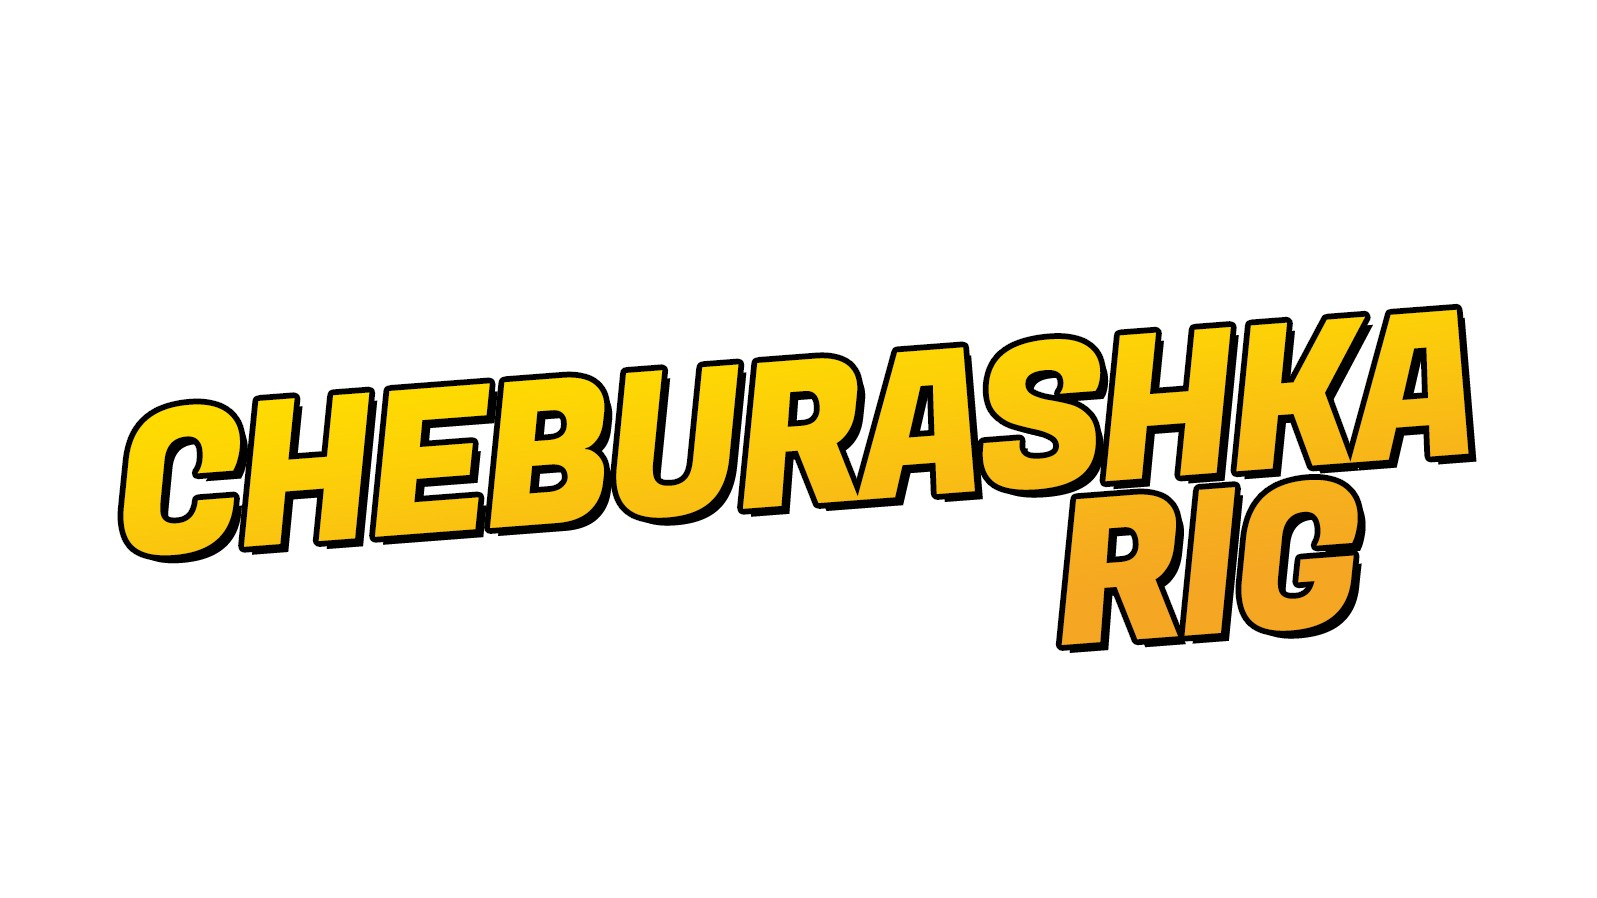 Cheburashka Rig